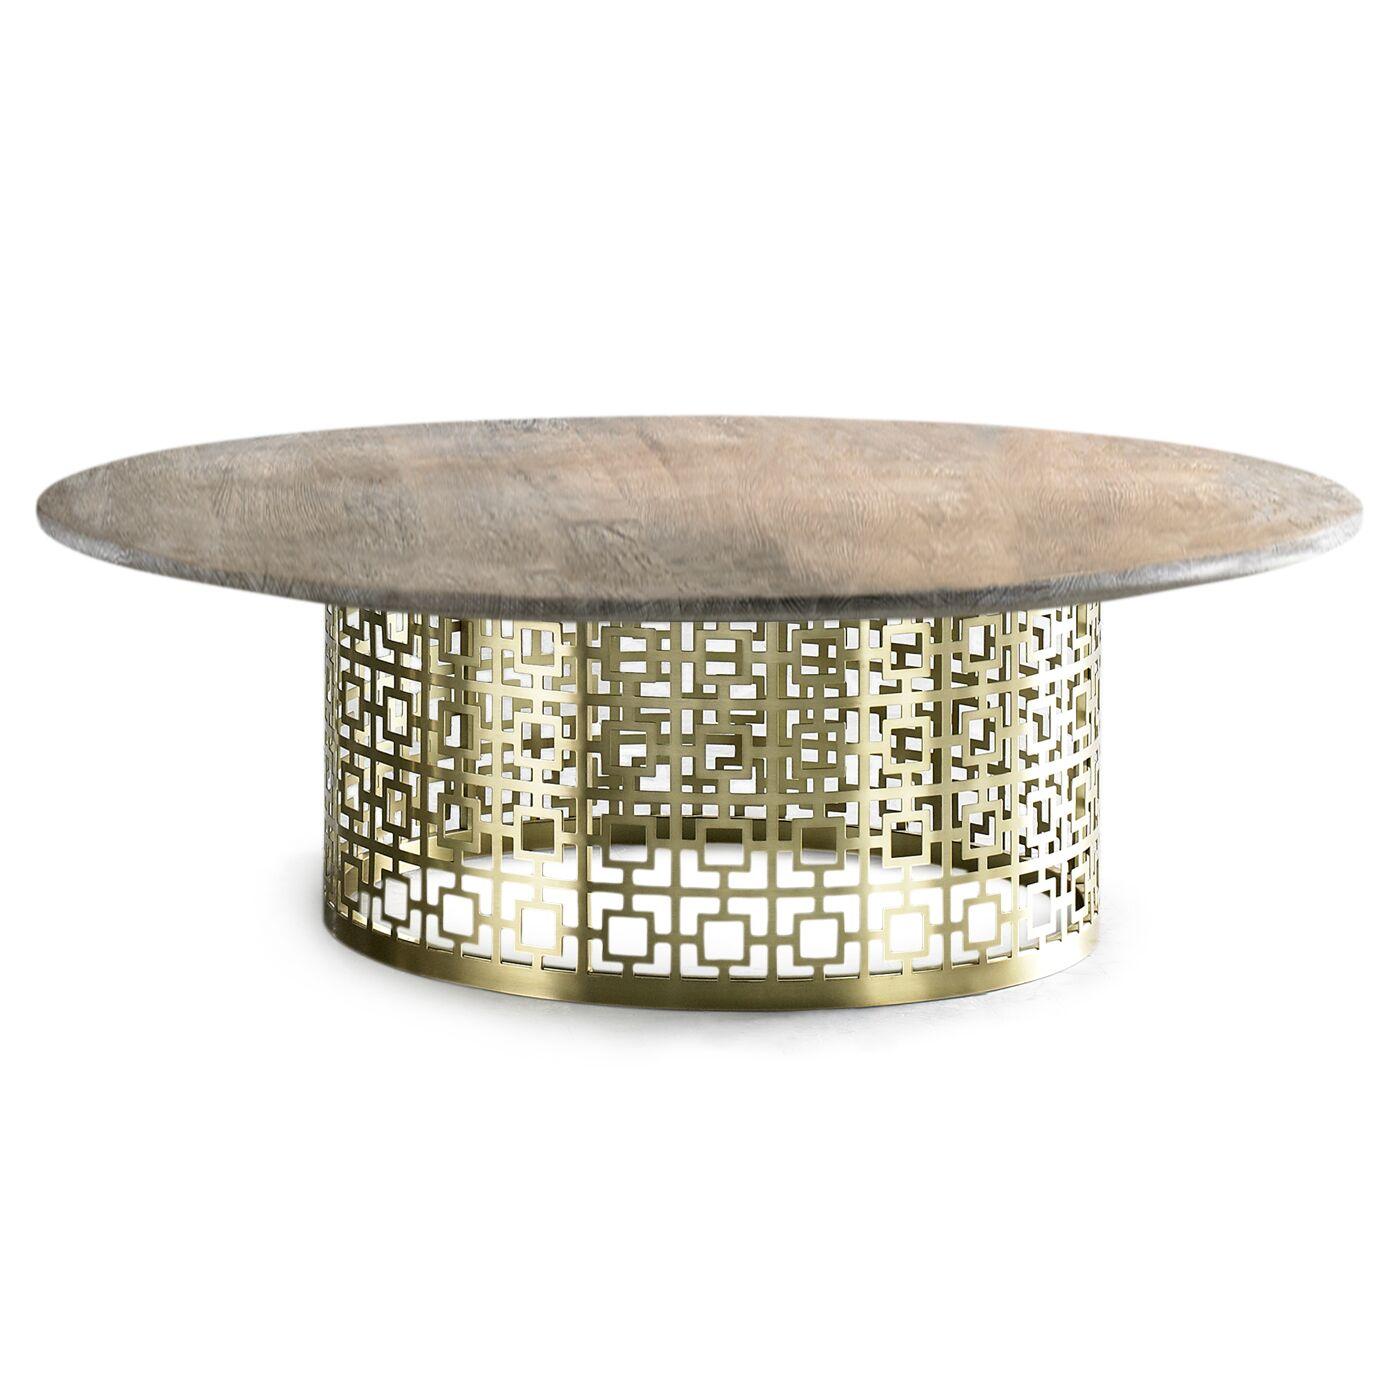 Nixon Coffee Table Base Color: Brass, Top Color: Black Marble